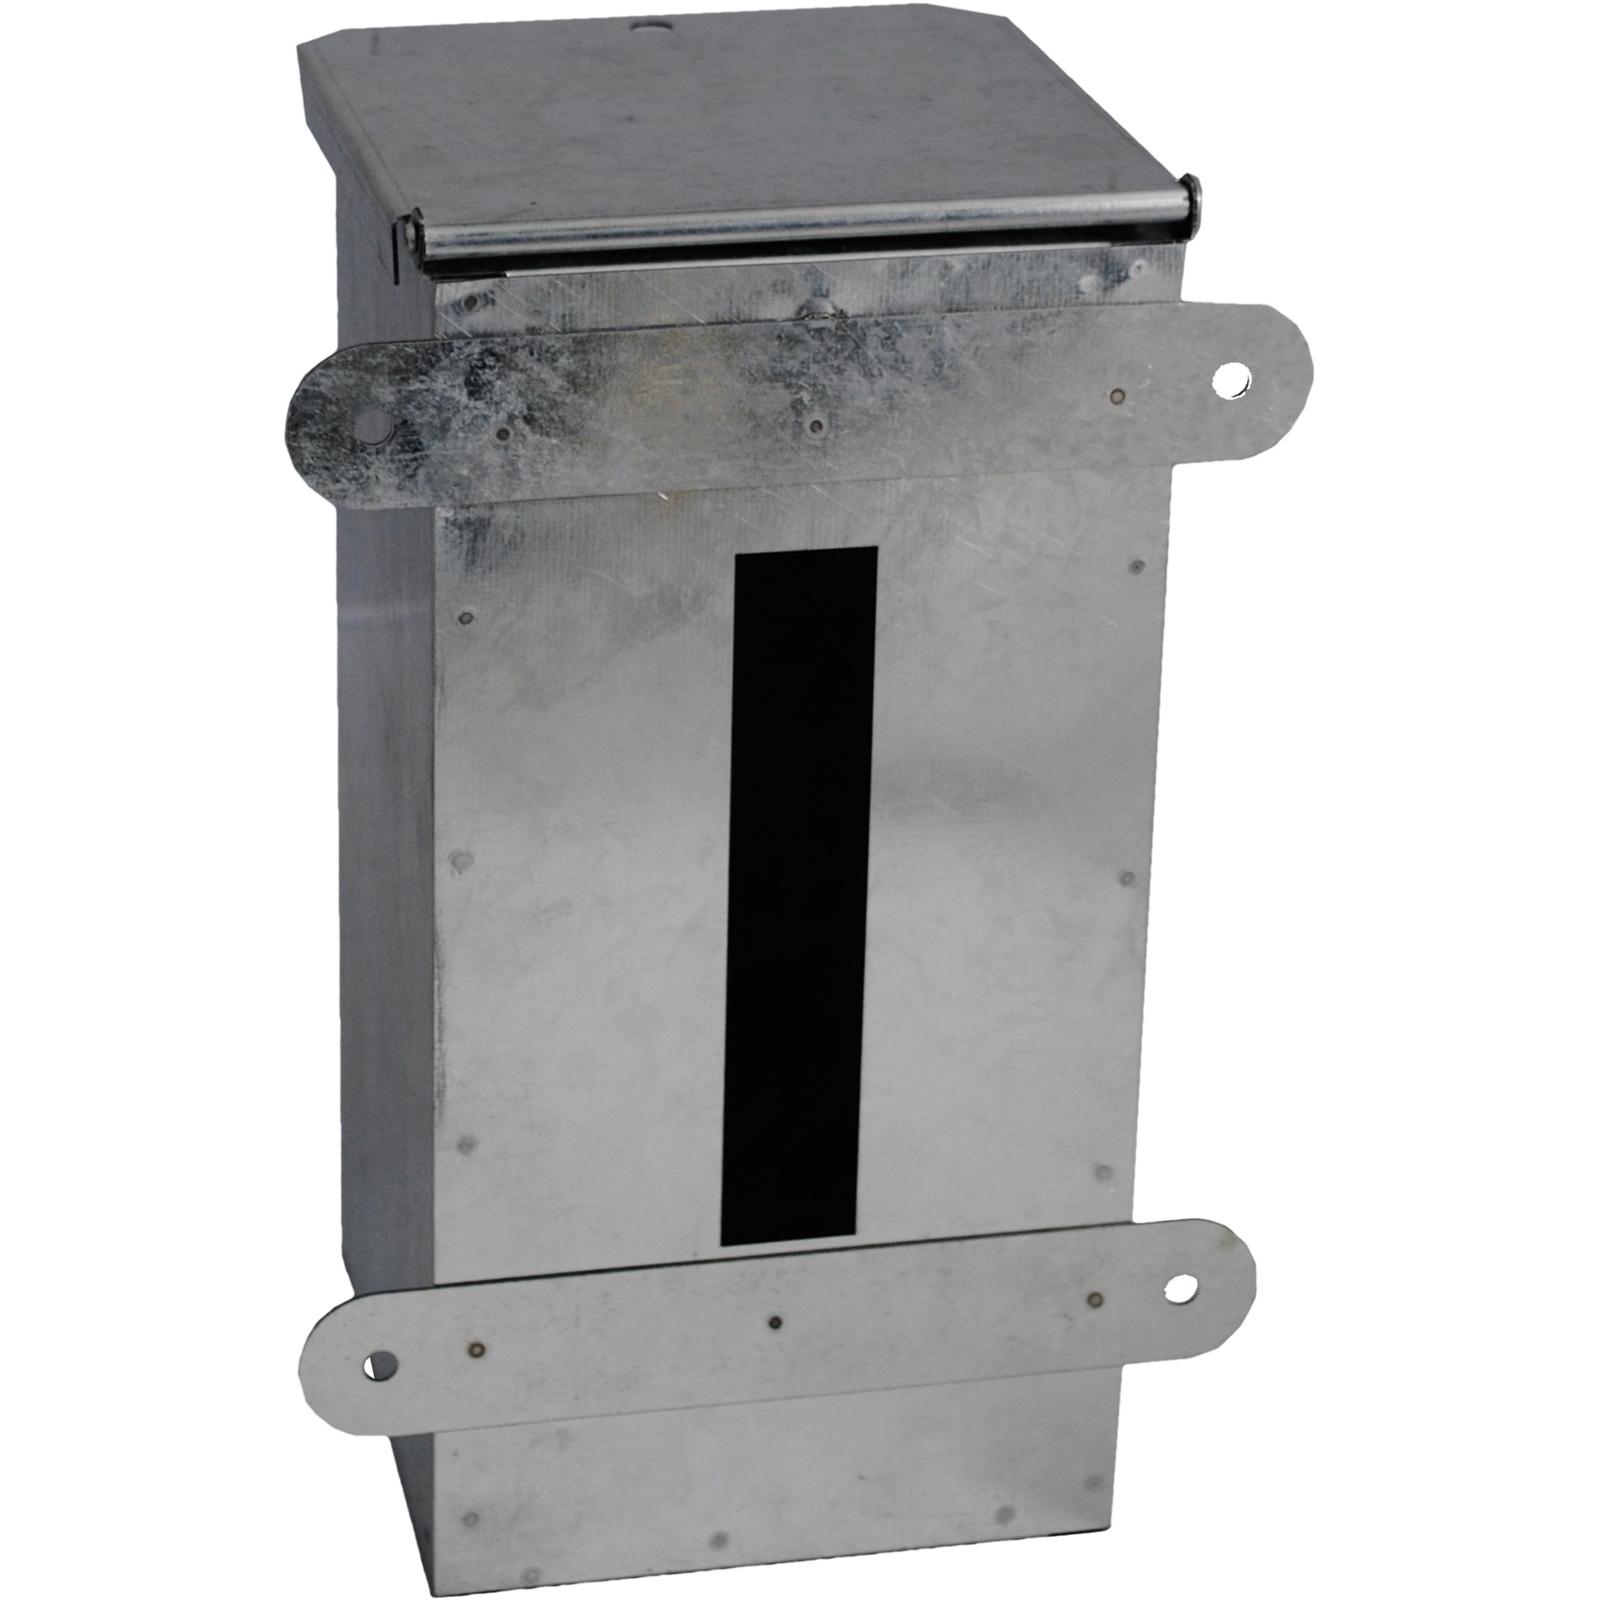 Sandleford Picket Fence Letterbox Nipper Unpainted SF-PB10